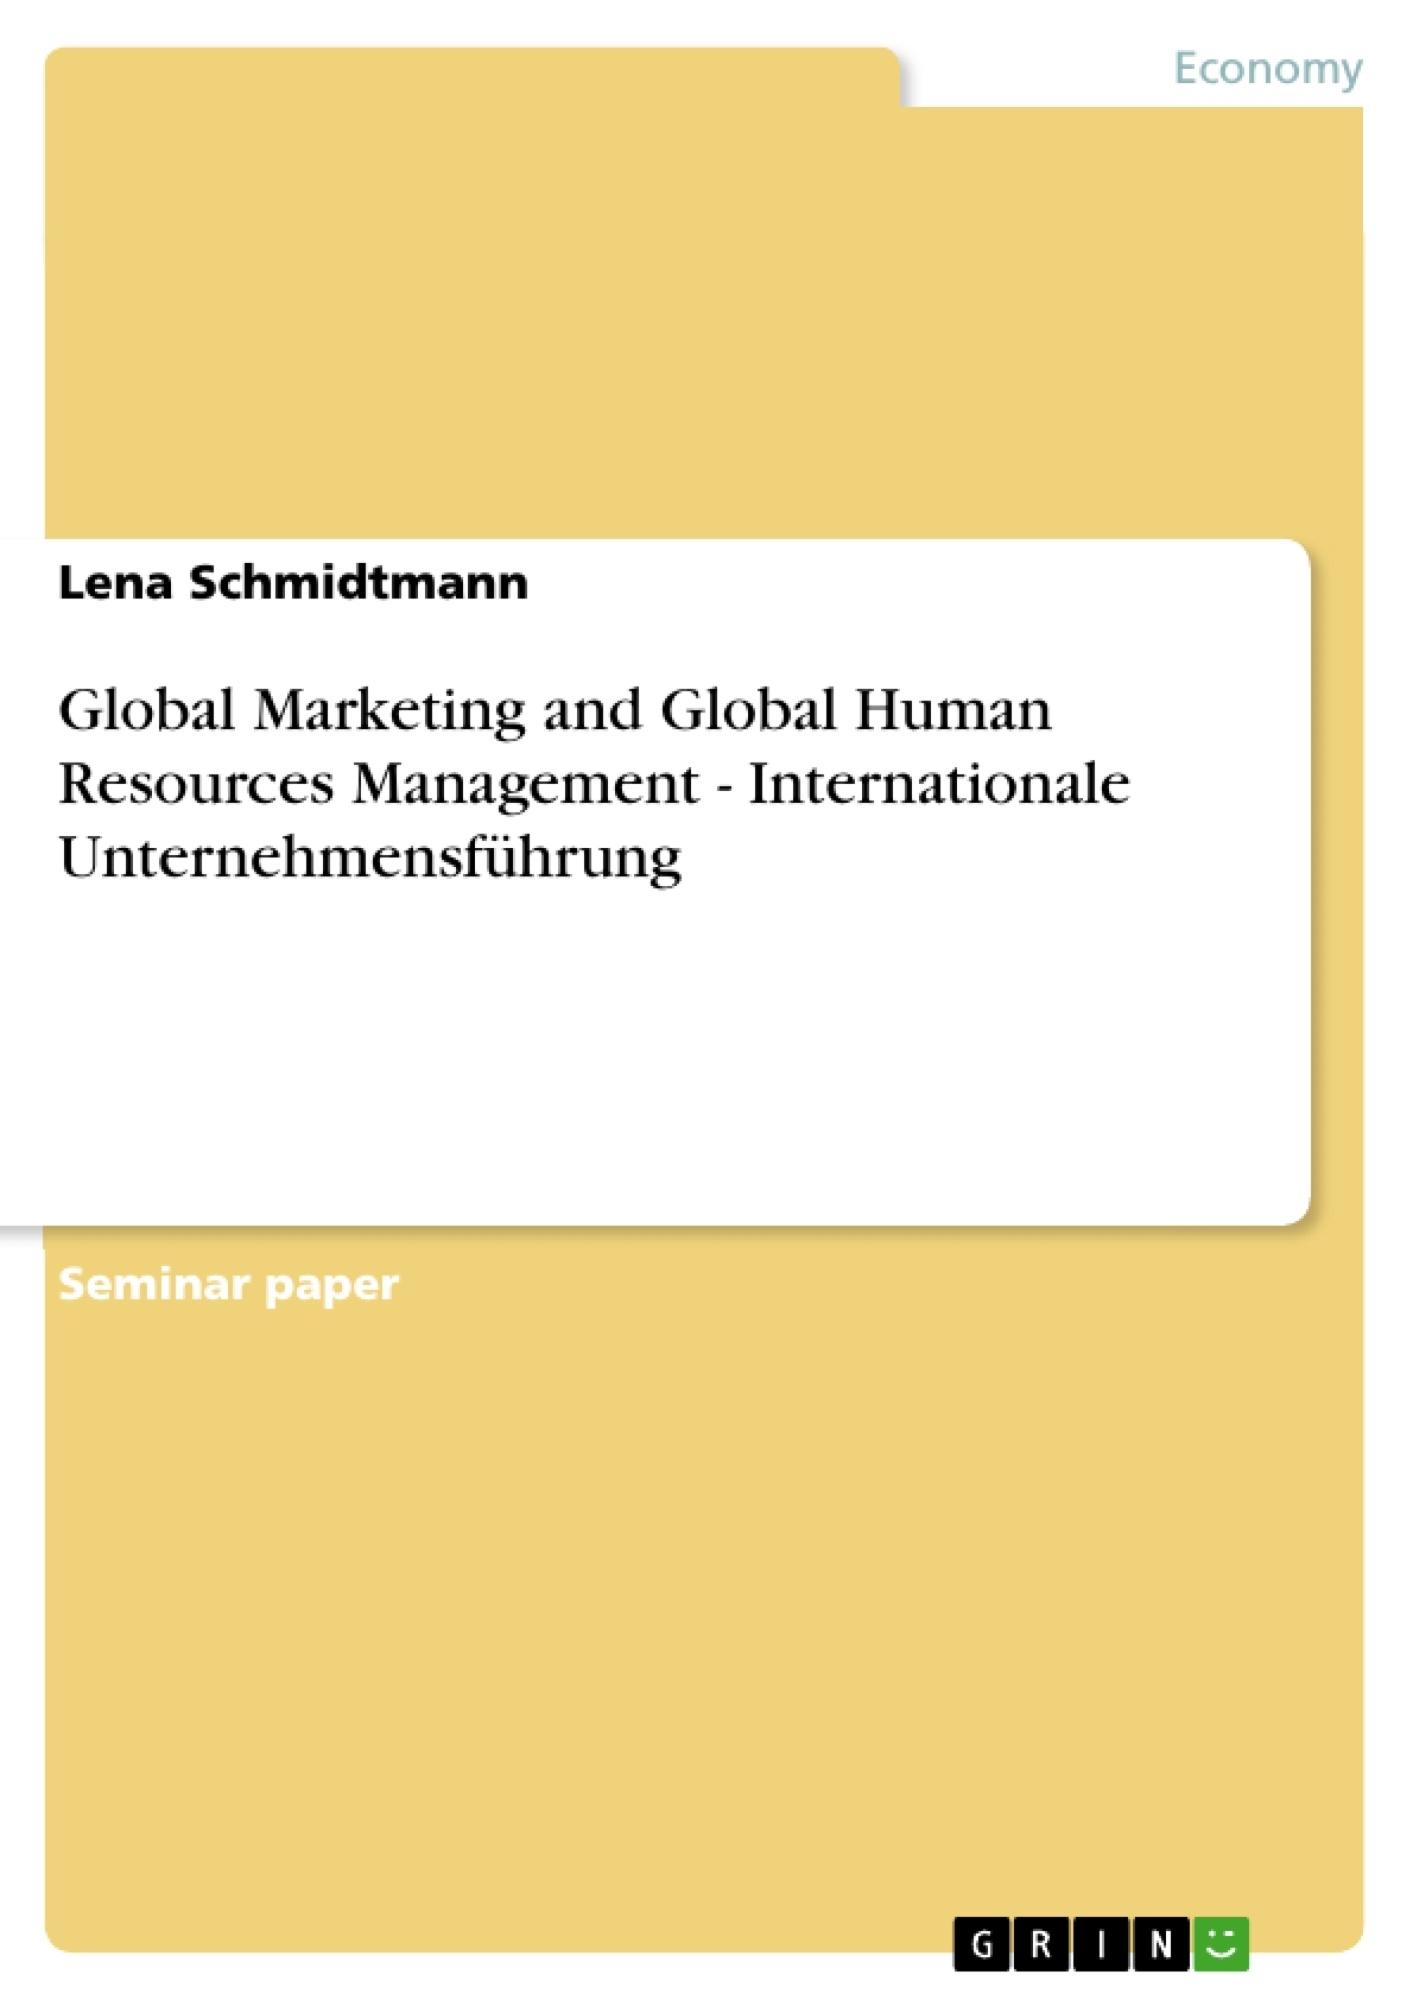 Title: Global Marketing and Global Human Resources Management - Internationale Unternehmensführung